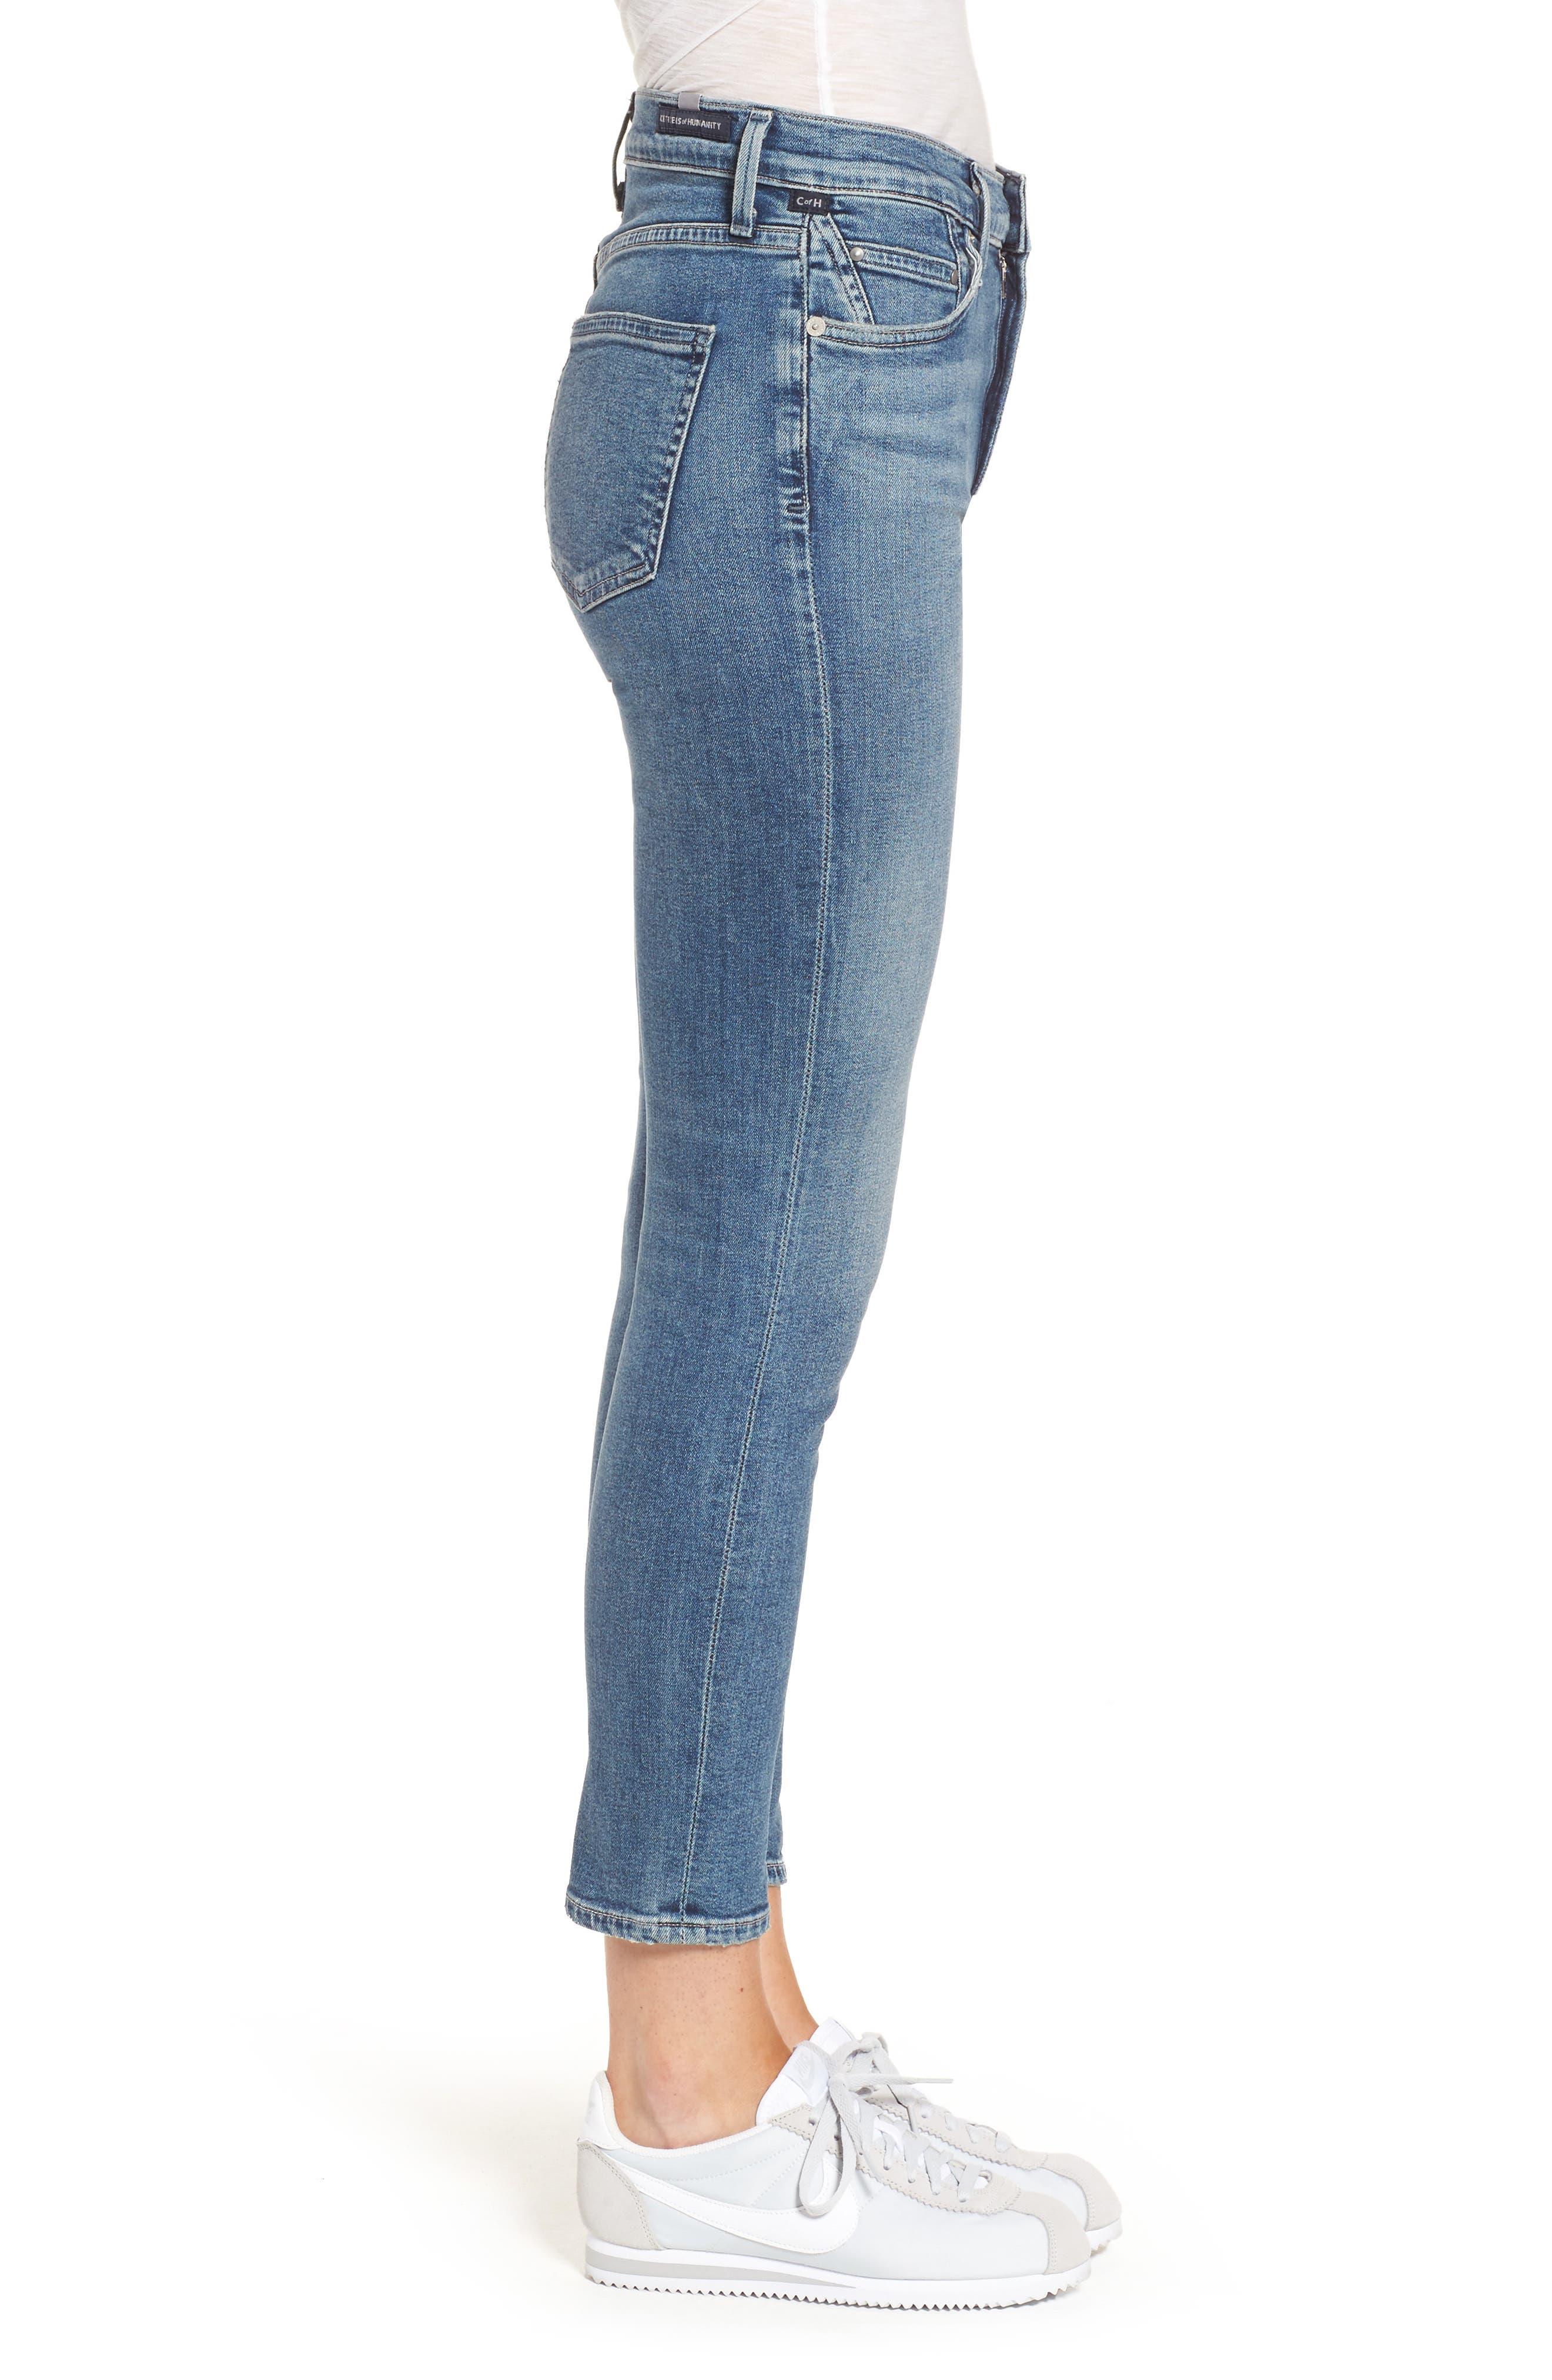 Rocket Crop Skinny Jeans,                             Alternate thumbnail 3, color,                             Orbit